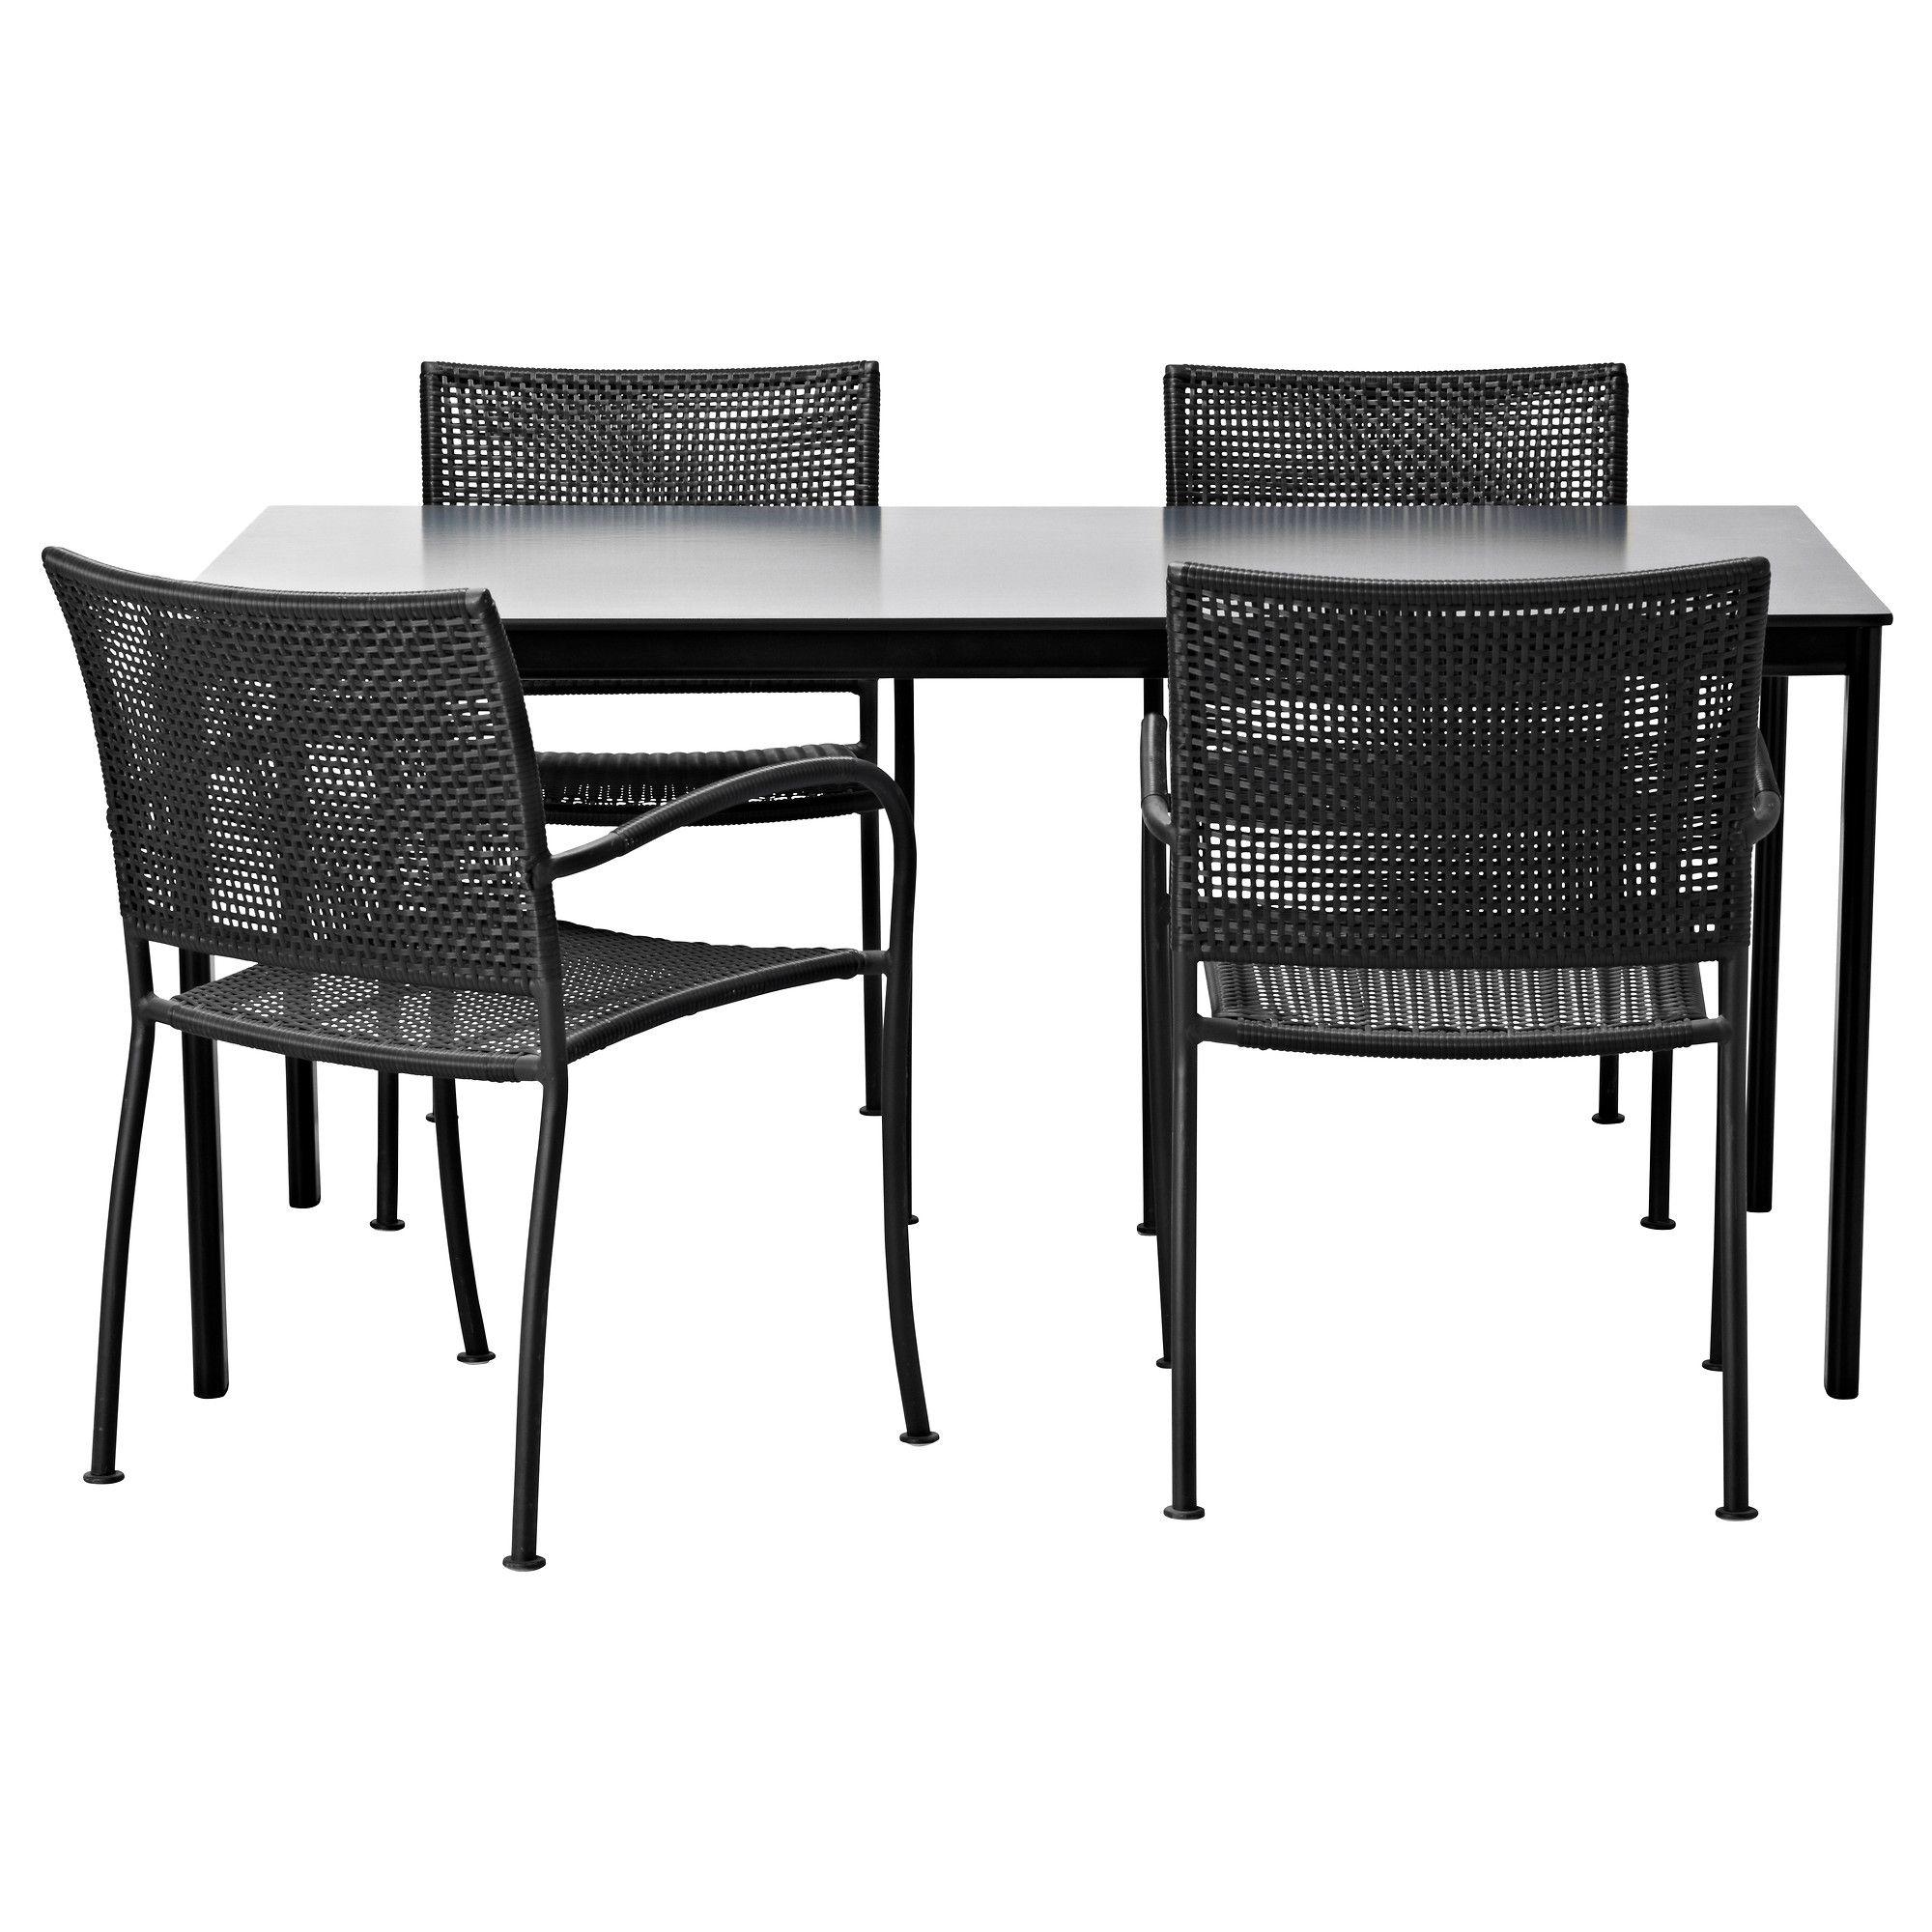 Ikea Us Furniture And Home Furnishings Modern Patio Furniture Ikea Dining Ikea Outdoor Furniture